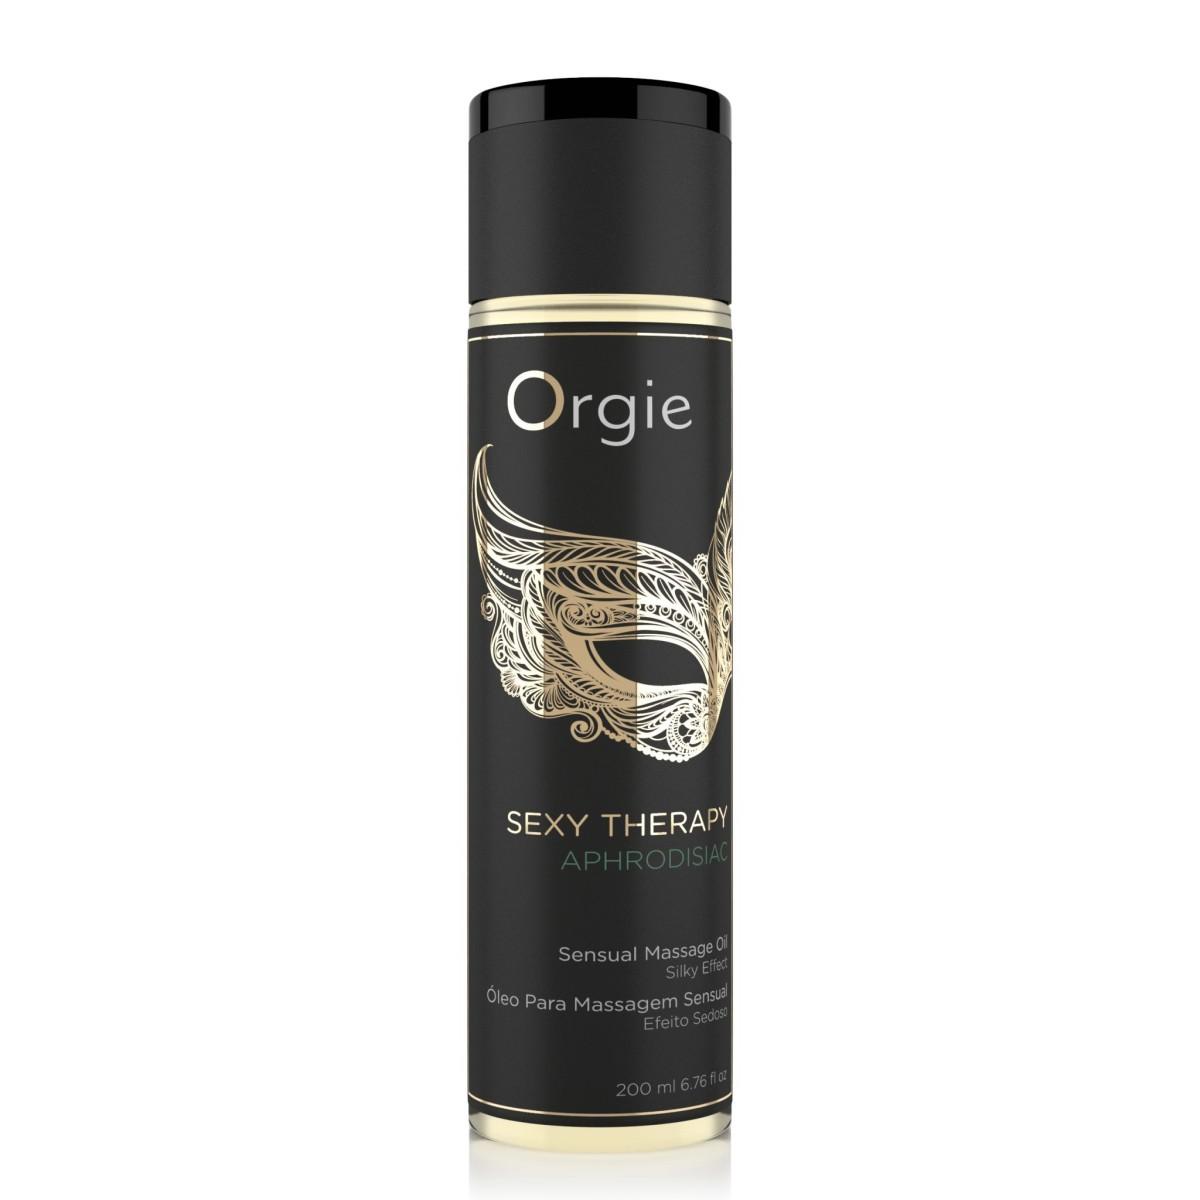 Orgie Sexy Therapy Aphrodisiac Massage Oil 200 ml